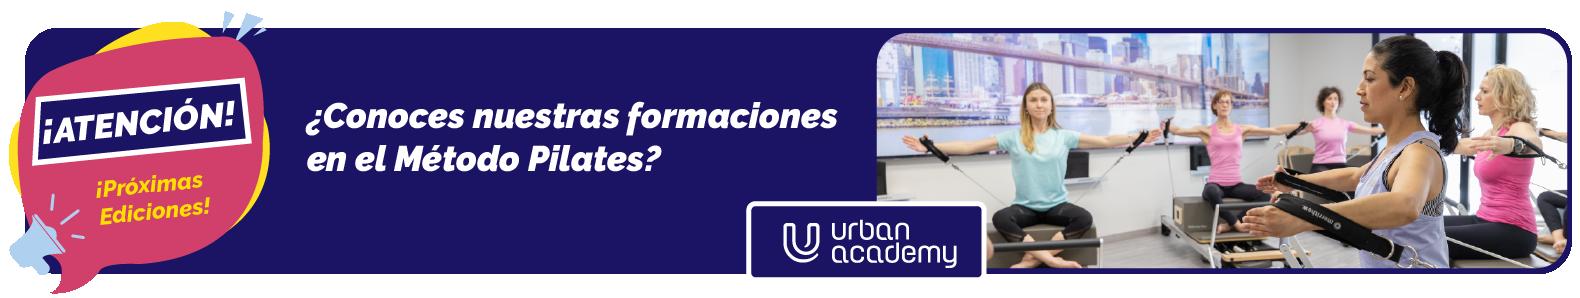 Formación de pilates en Valencia. Mejor centro de Formación Pilates.